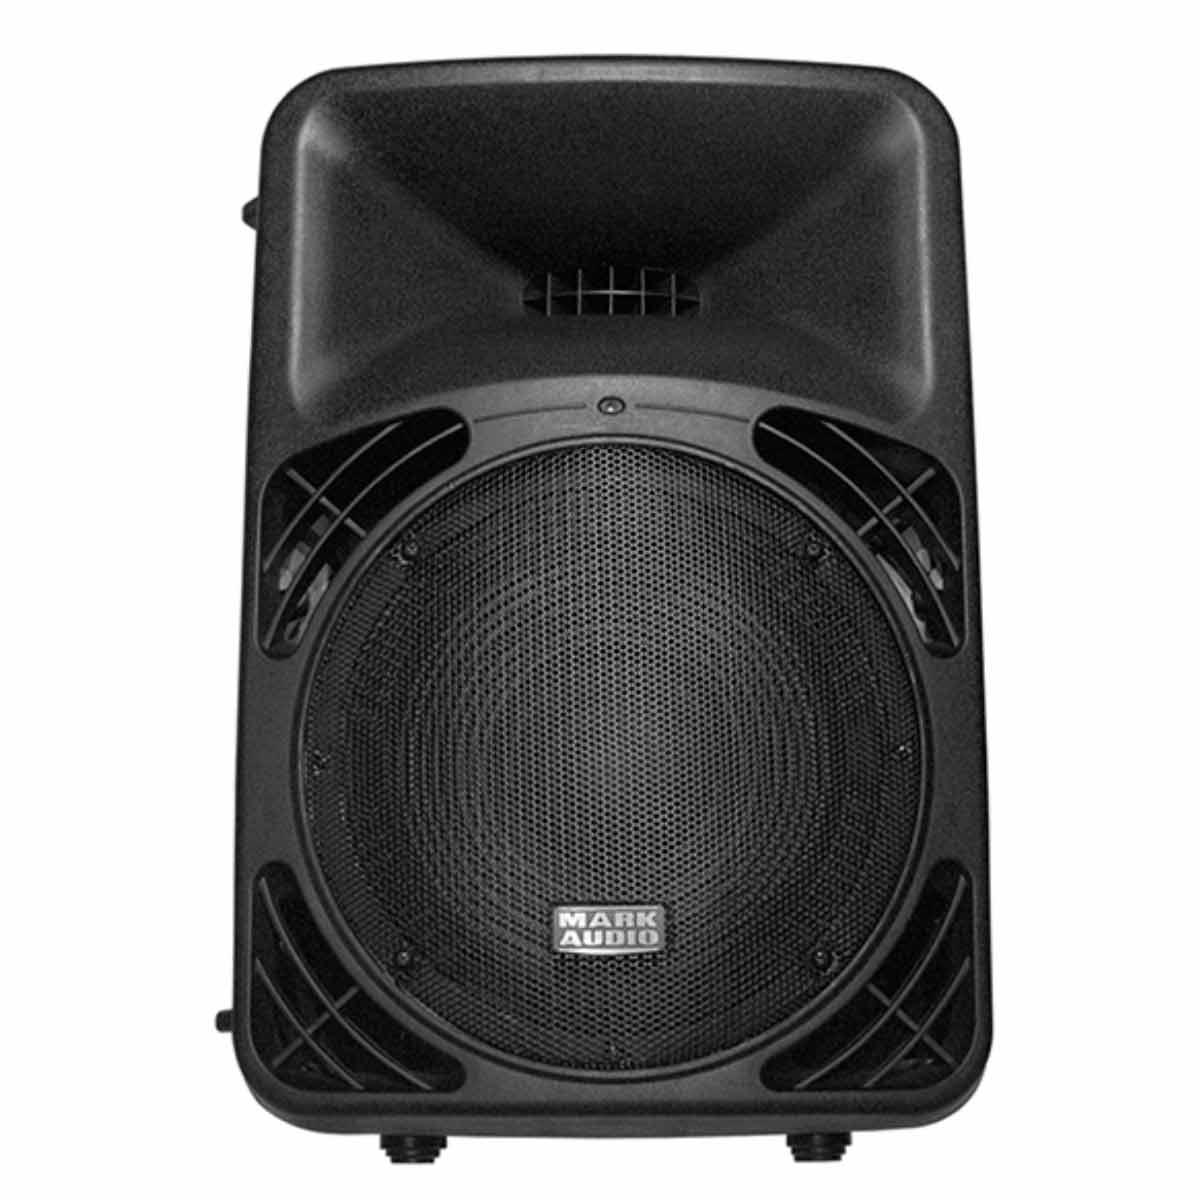 MK1220ABT - Caixa Ativa 200W c/ Bluetooth e USB MK 1220A BT - Mark Audio